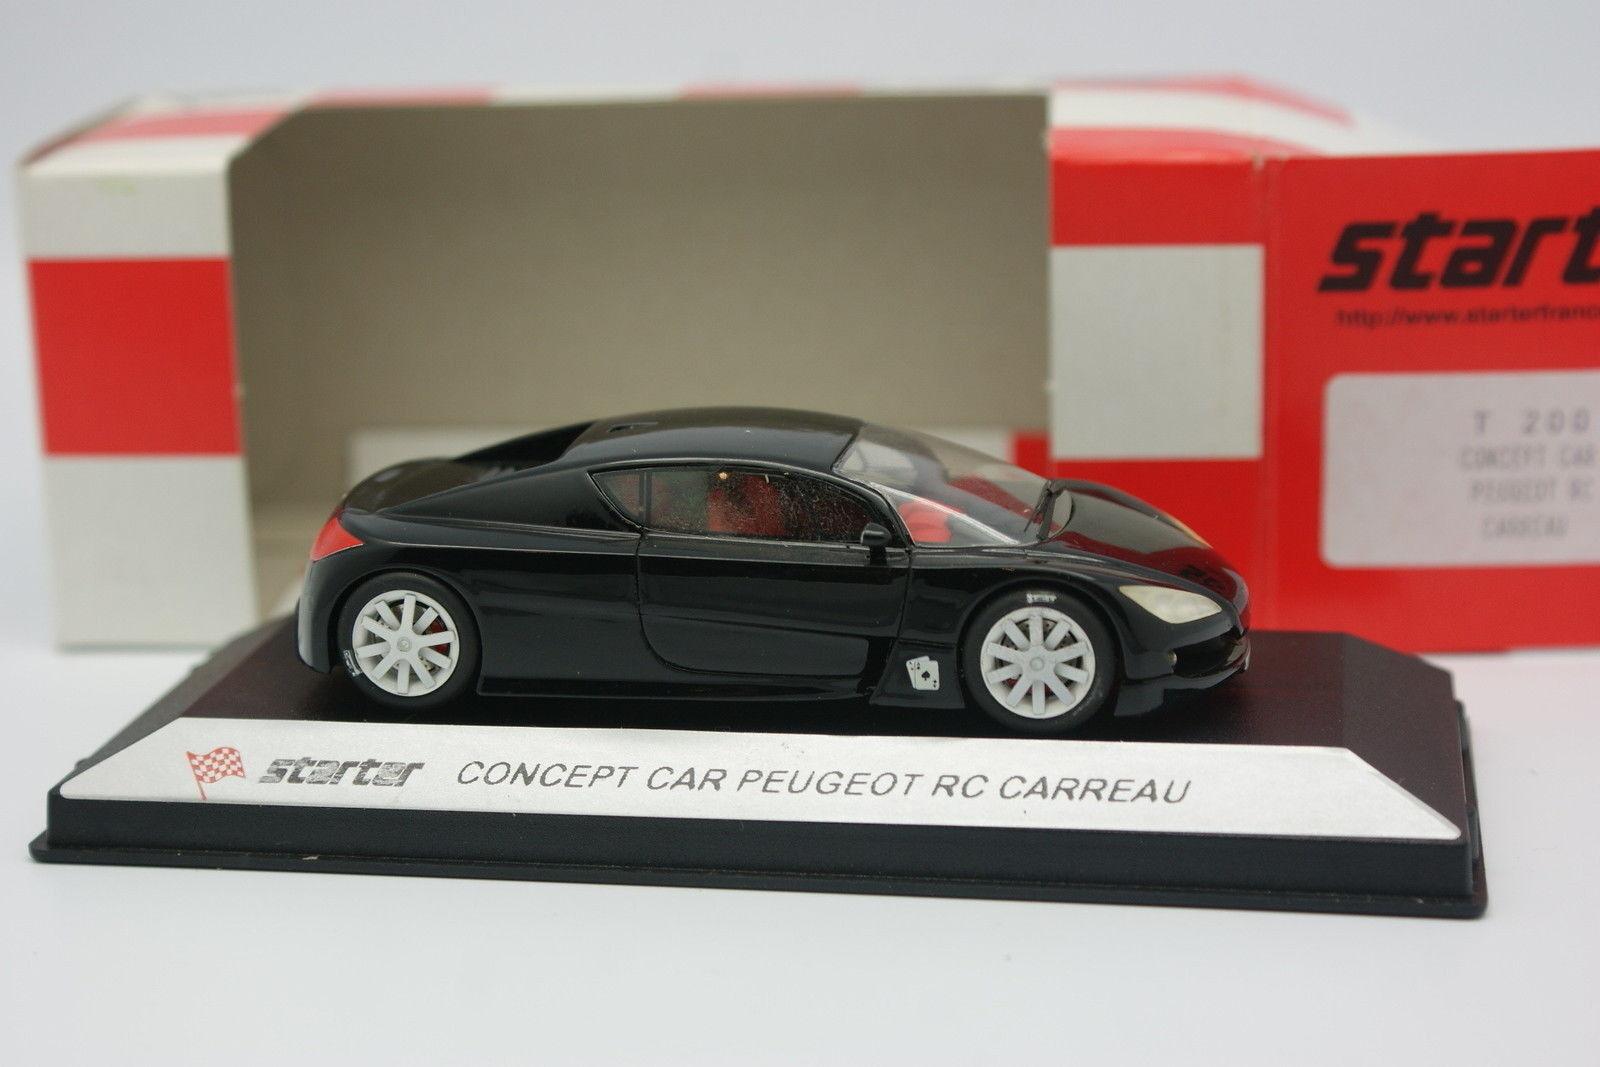 estrellater 143  Peugeot Concept auto Rc Quadro